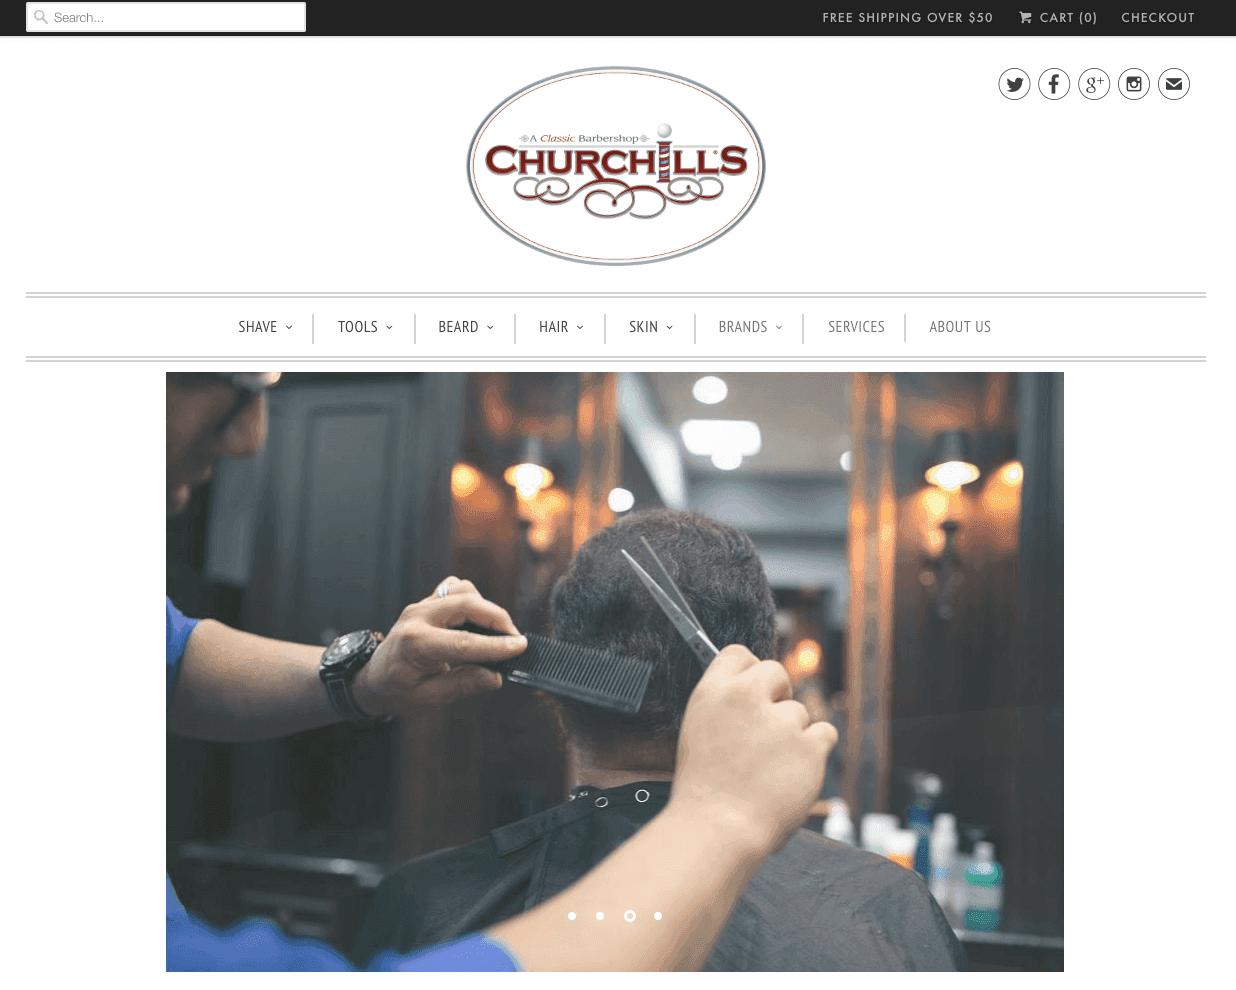 Churchills Barbershop